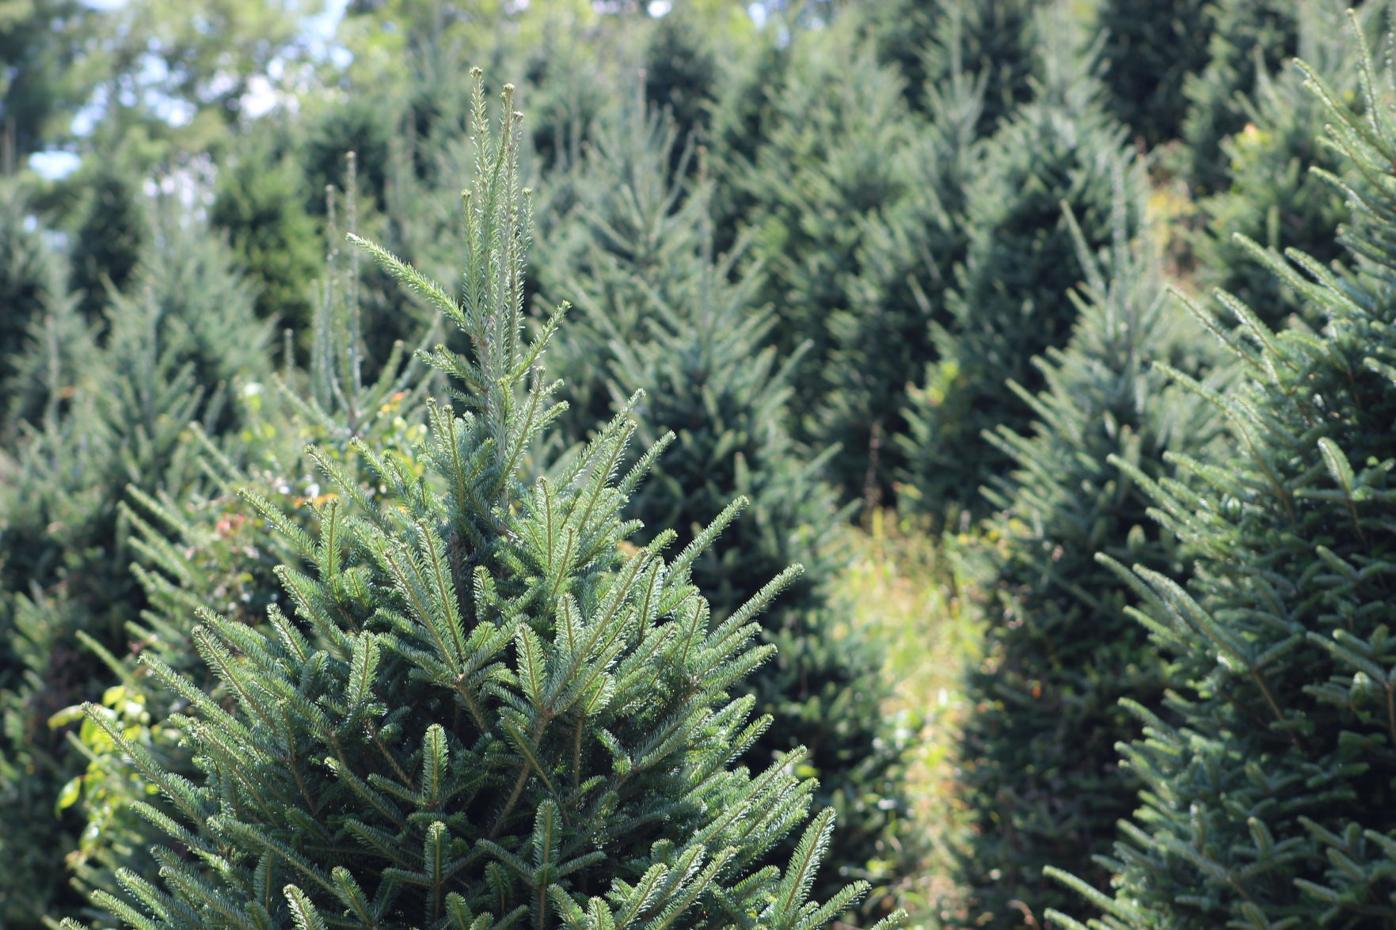 Christmas Trees 2021 Watauga Democrat It S Fraser Season Choose And Cut Farms Ready To Sell Christmas Trees News Wataugademocrat Com